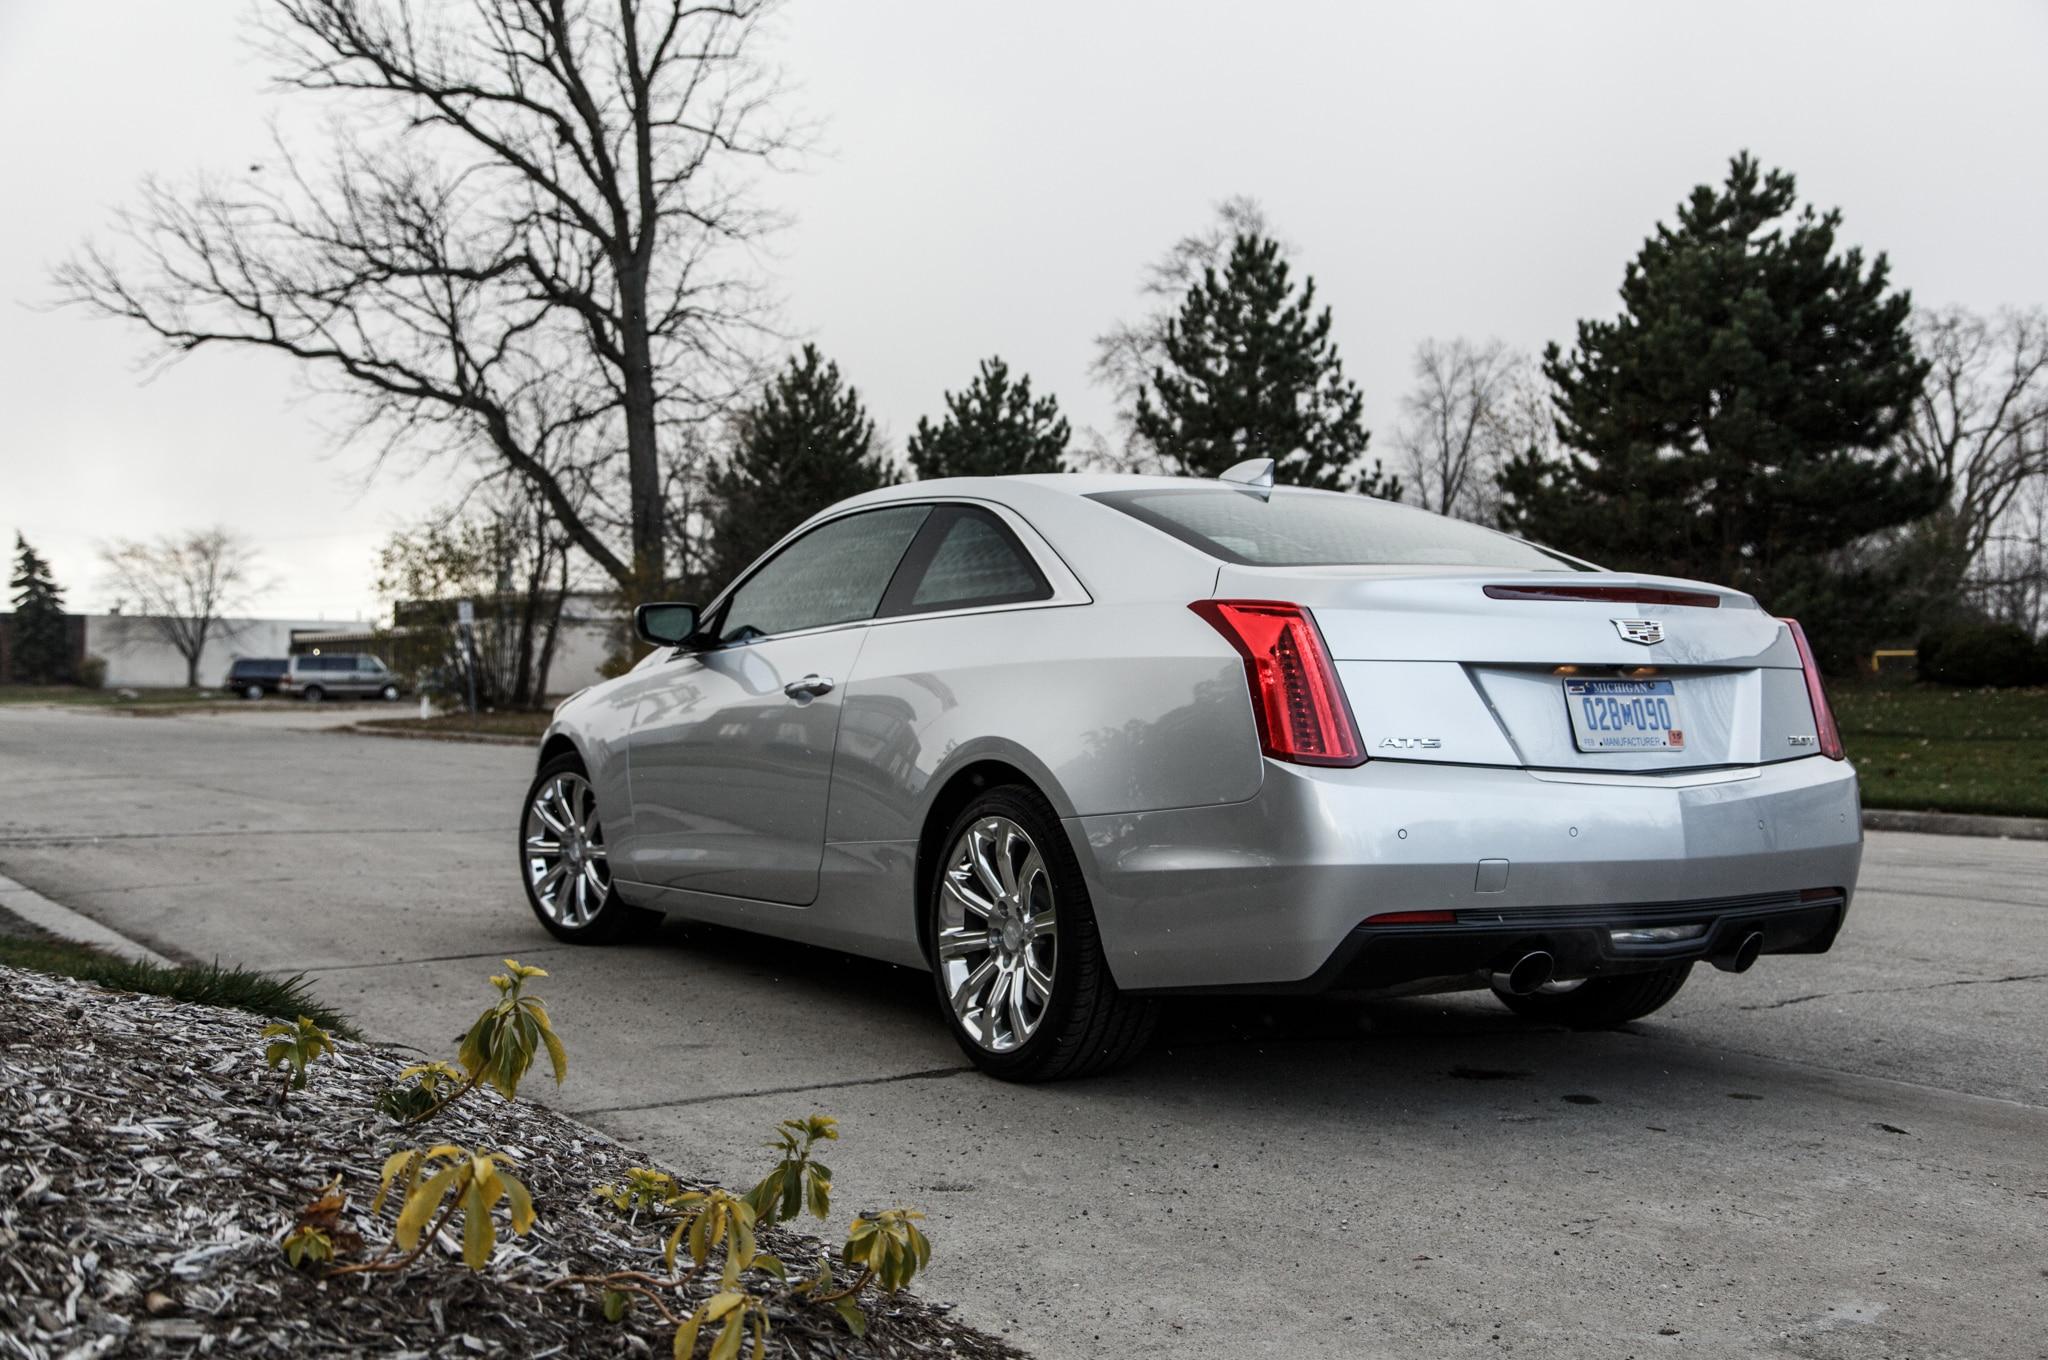 2015 Cadillac ATS Coupe 2 0T Manual Around the Block